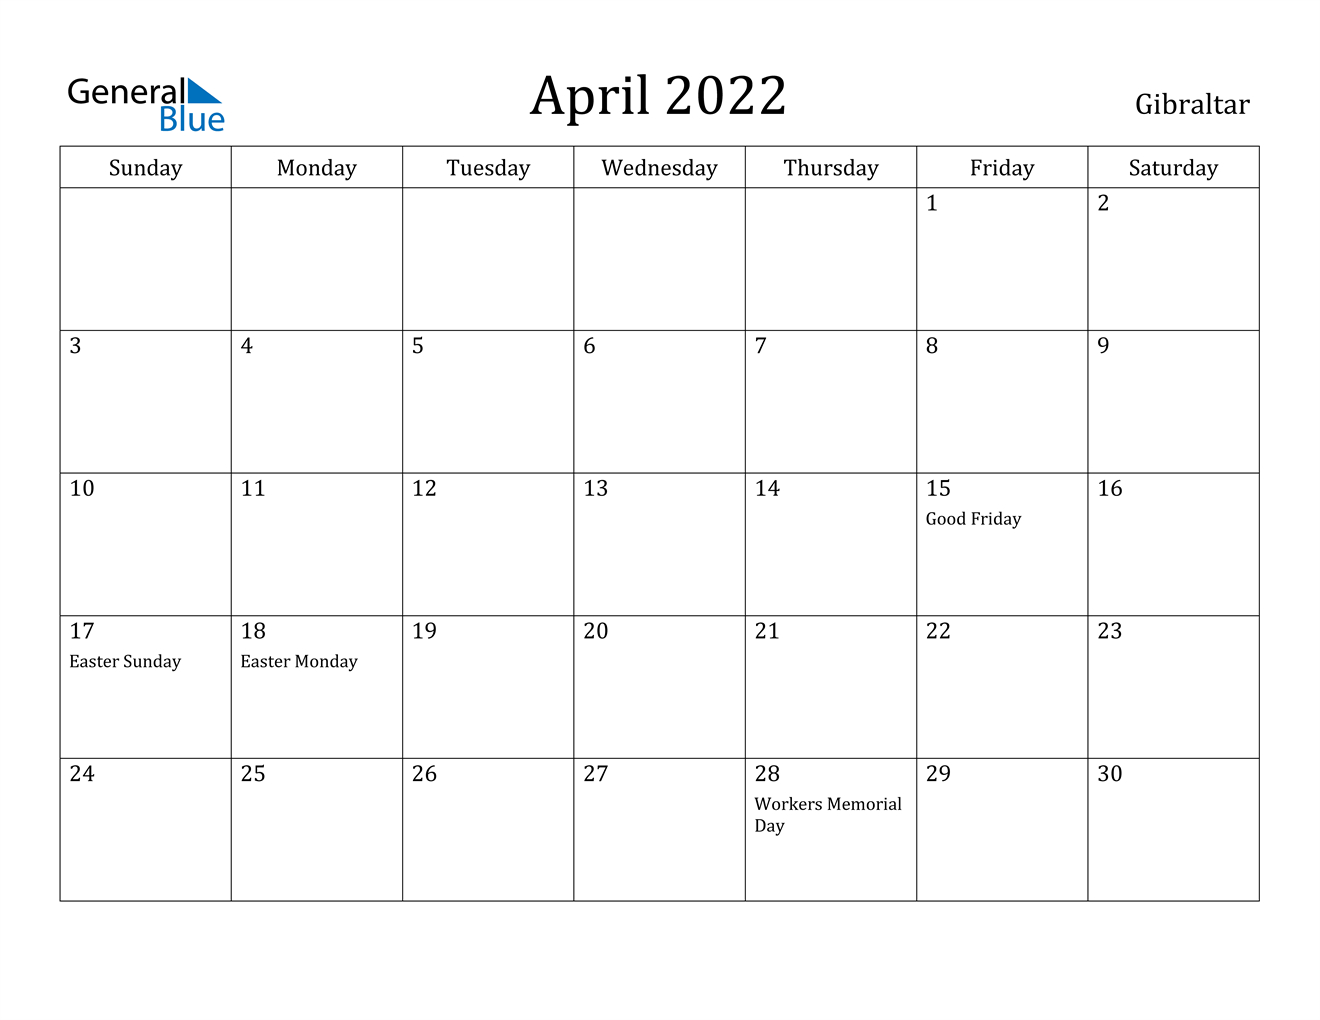 April 2022 Calendar - Gibraltar inside March April 2022 Printable Calendar